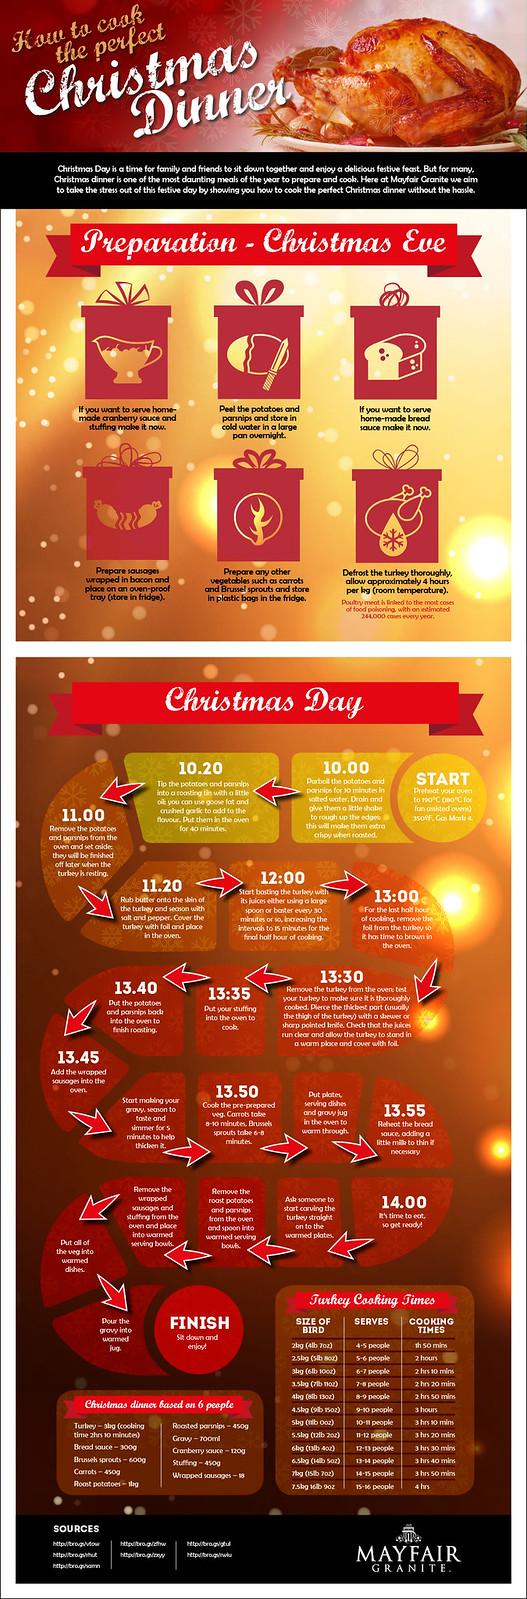 xmas-dinner-infographic